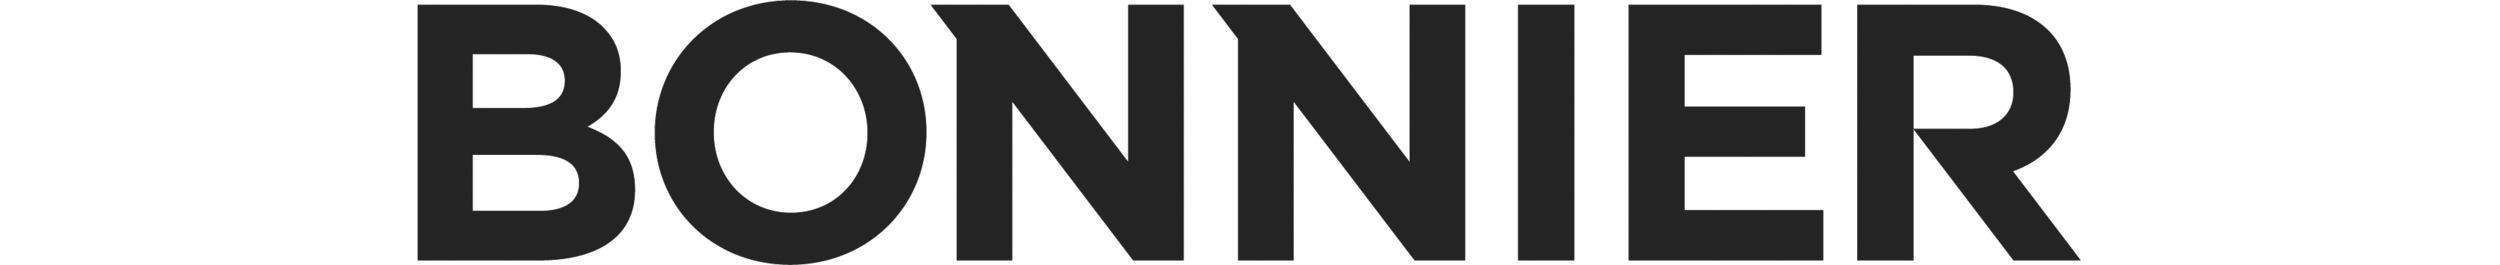 Bonnier_logo_2009.png